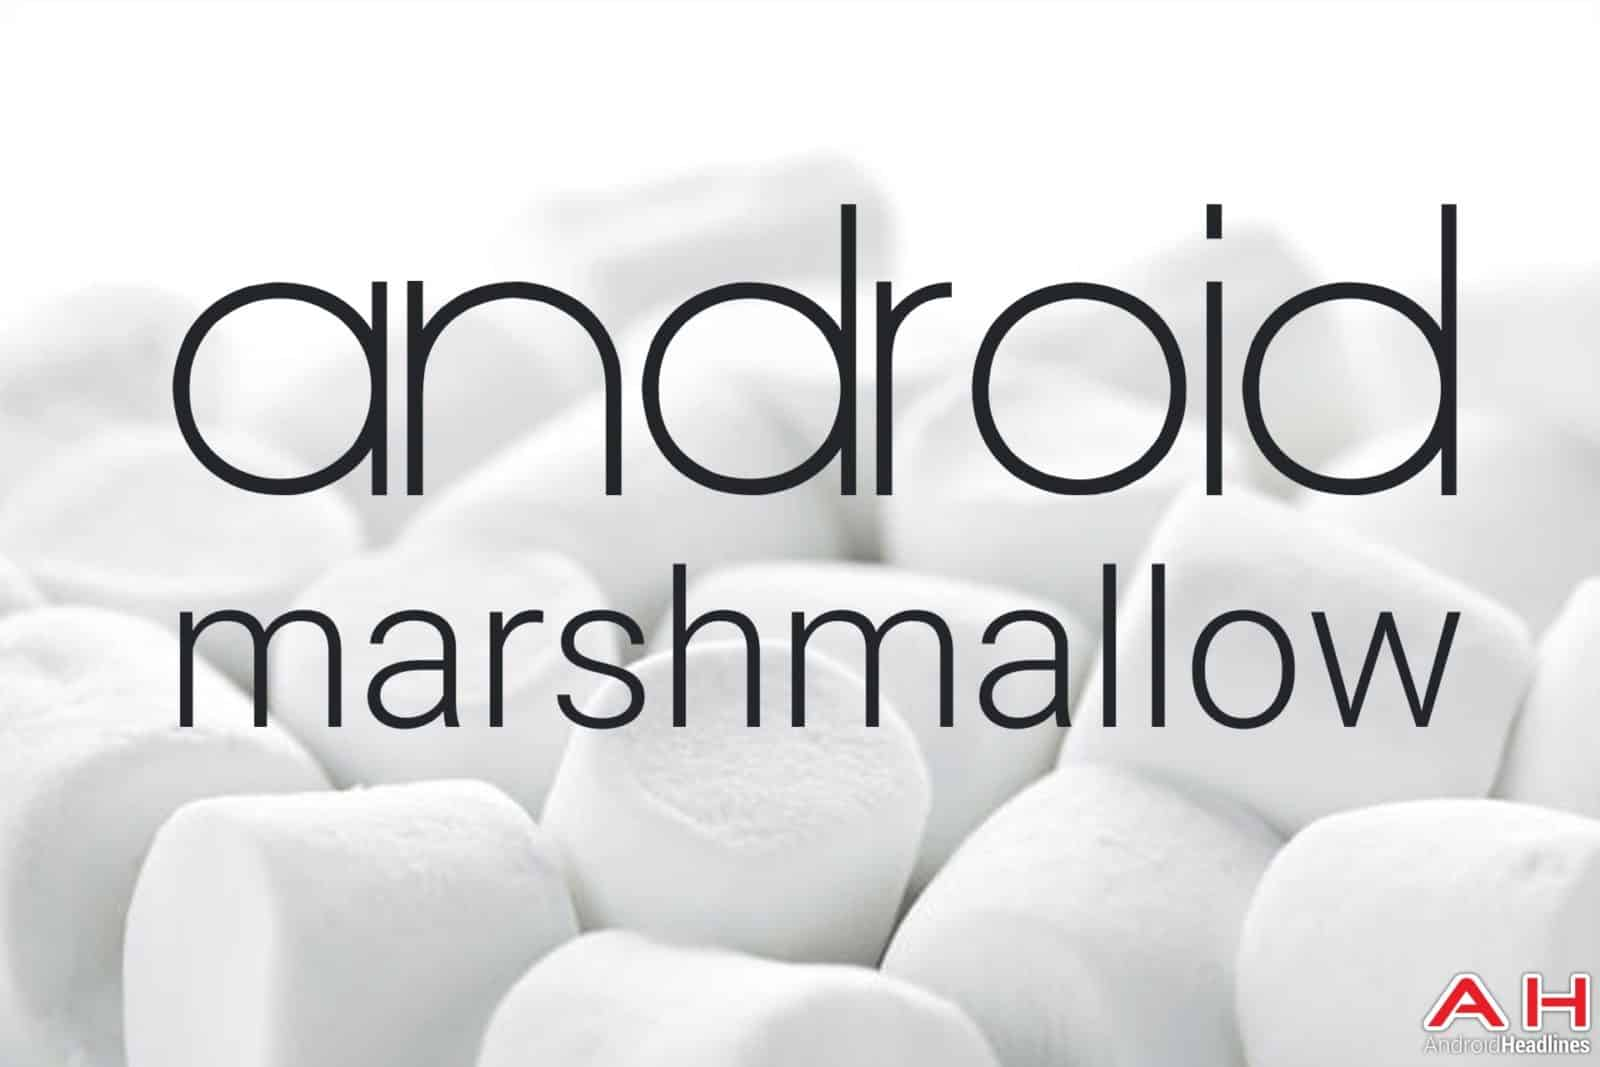 AH Android Marshmallow Logo 1.8